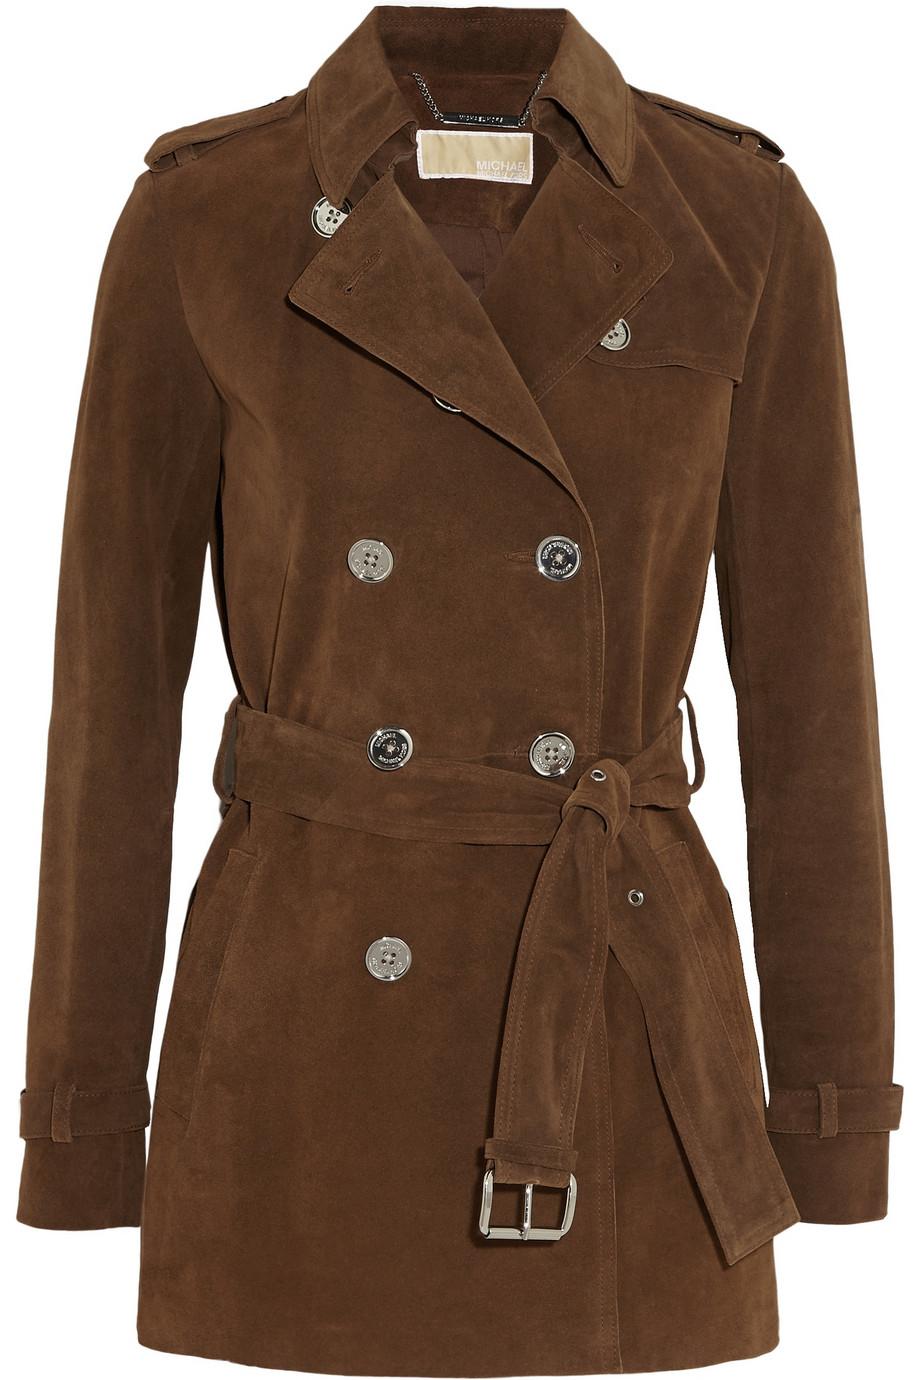 michael michael kors suede trench coat in brown lyst